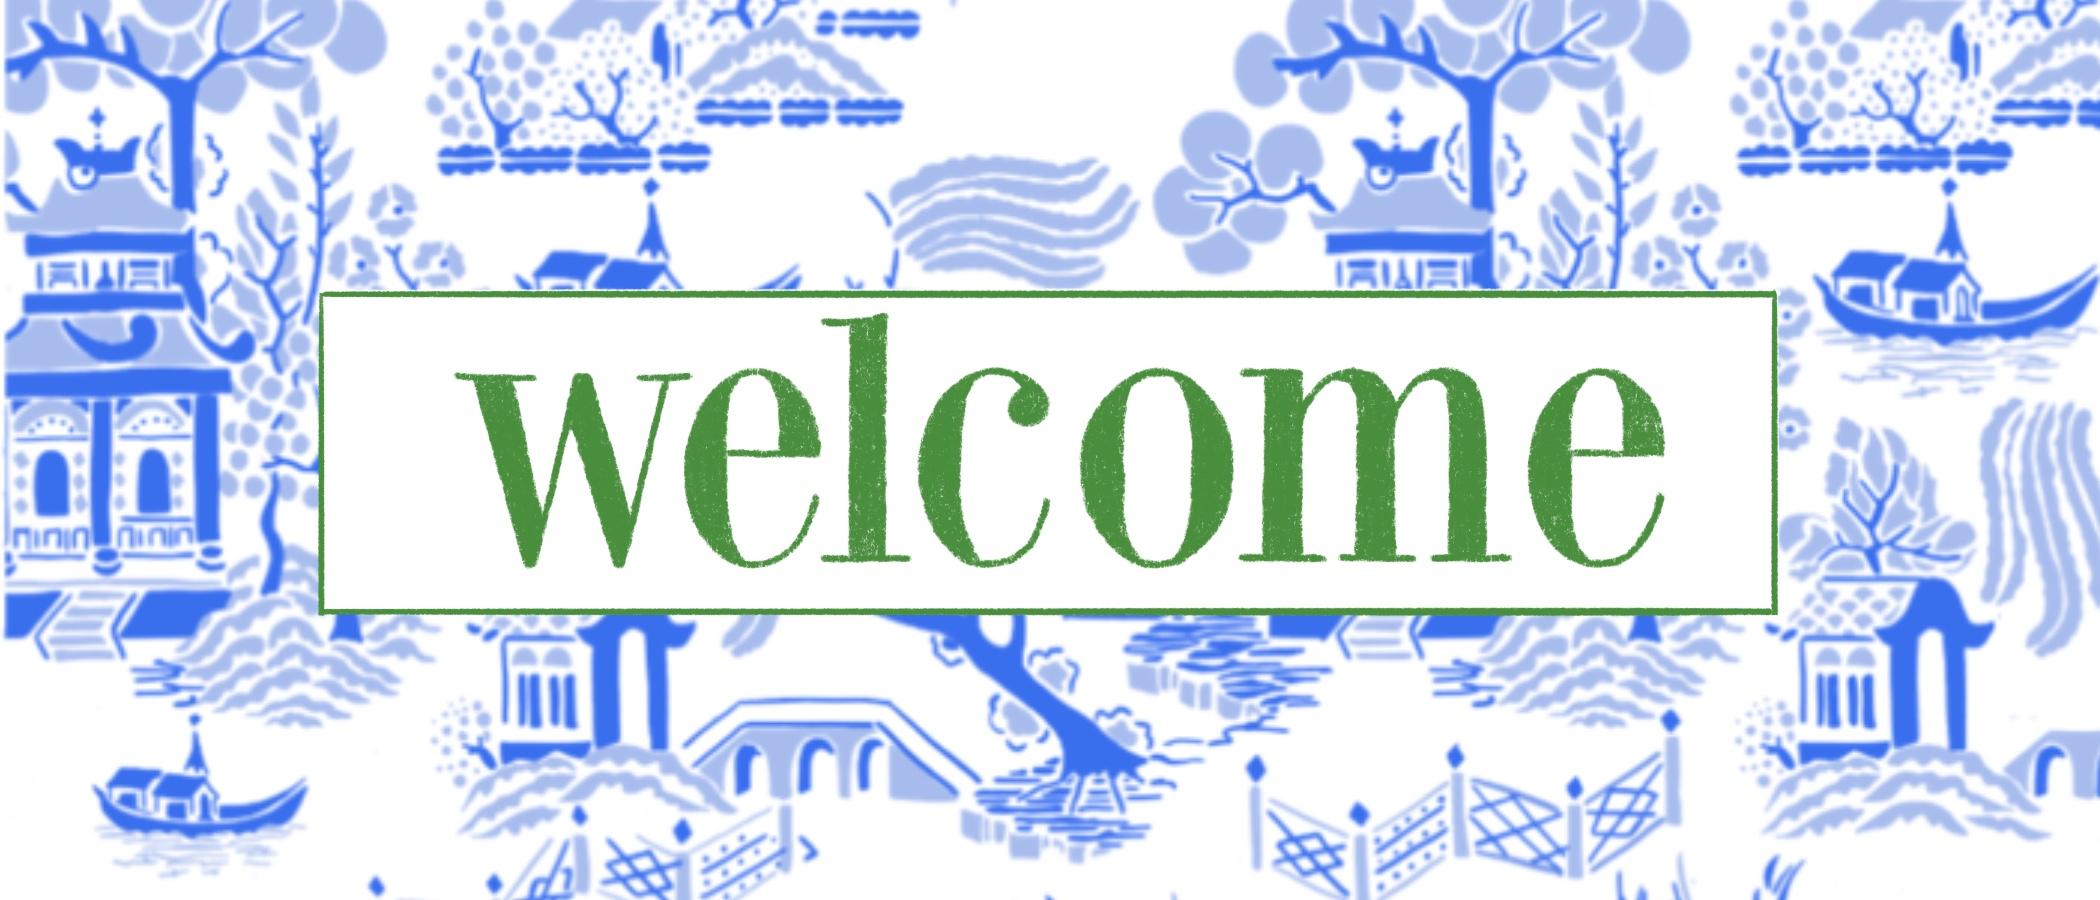 welcome header.jpeg